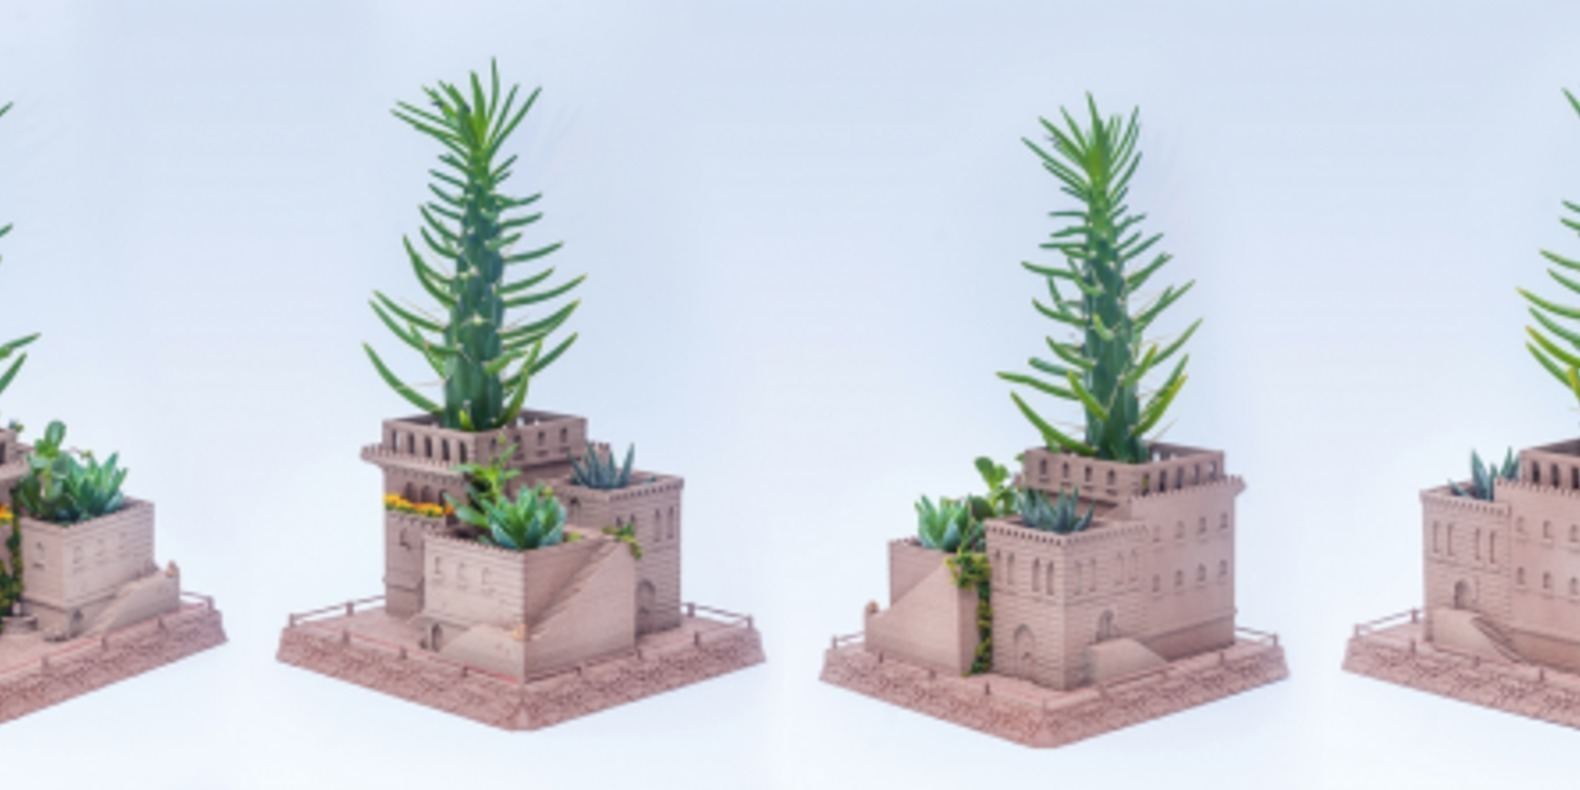 http://fichier3d.fr/wp-content/uploads/2016/08/YURIYSKLYAR-planter-tinkercad-makerbot-fichier-3D-cults-2.png